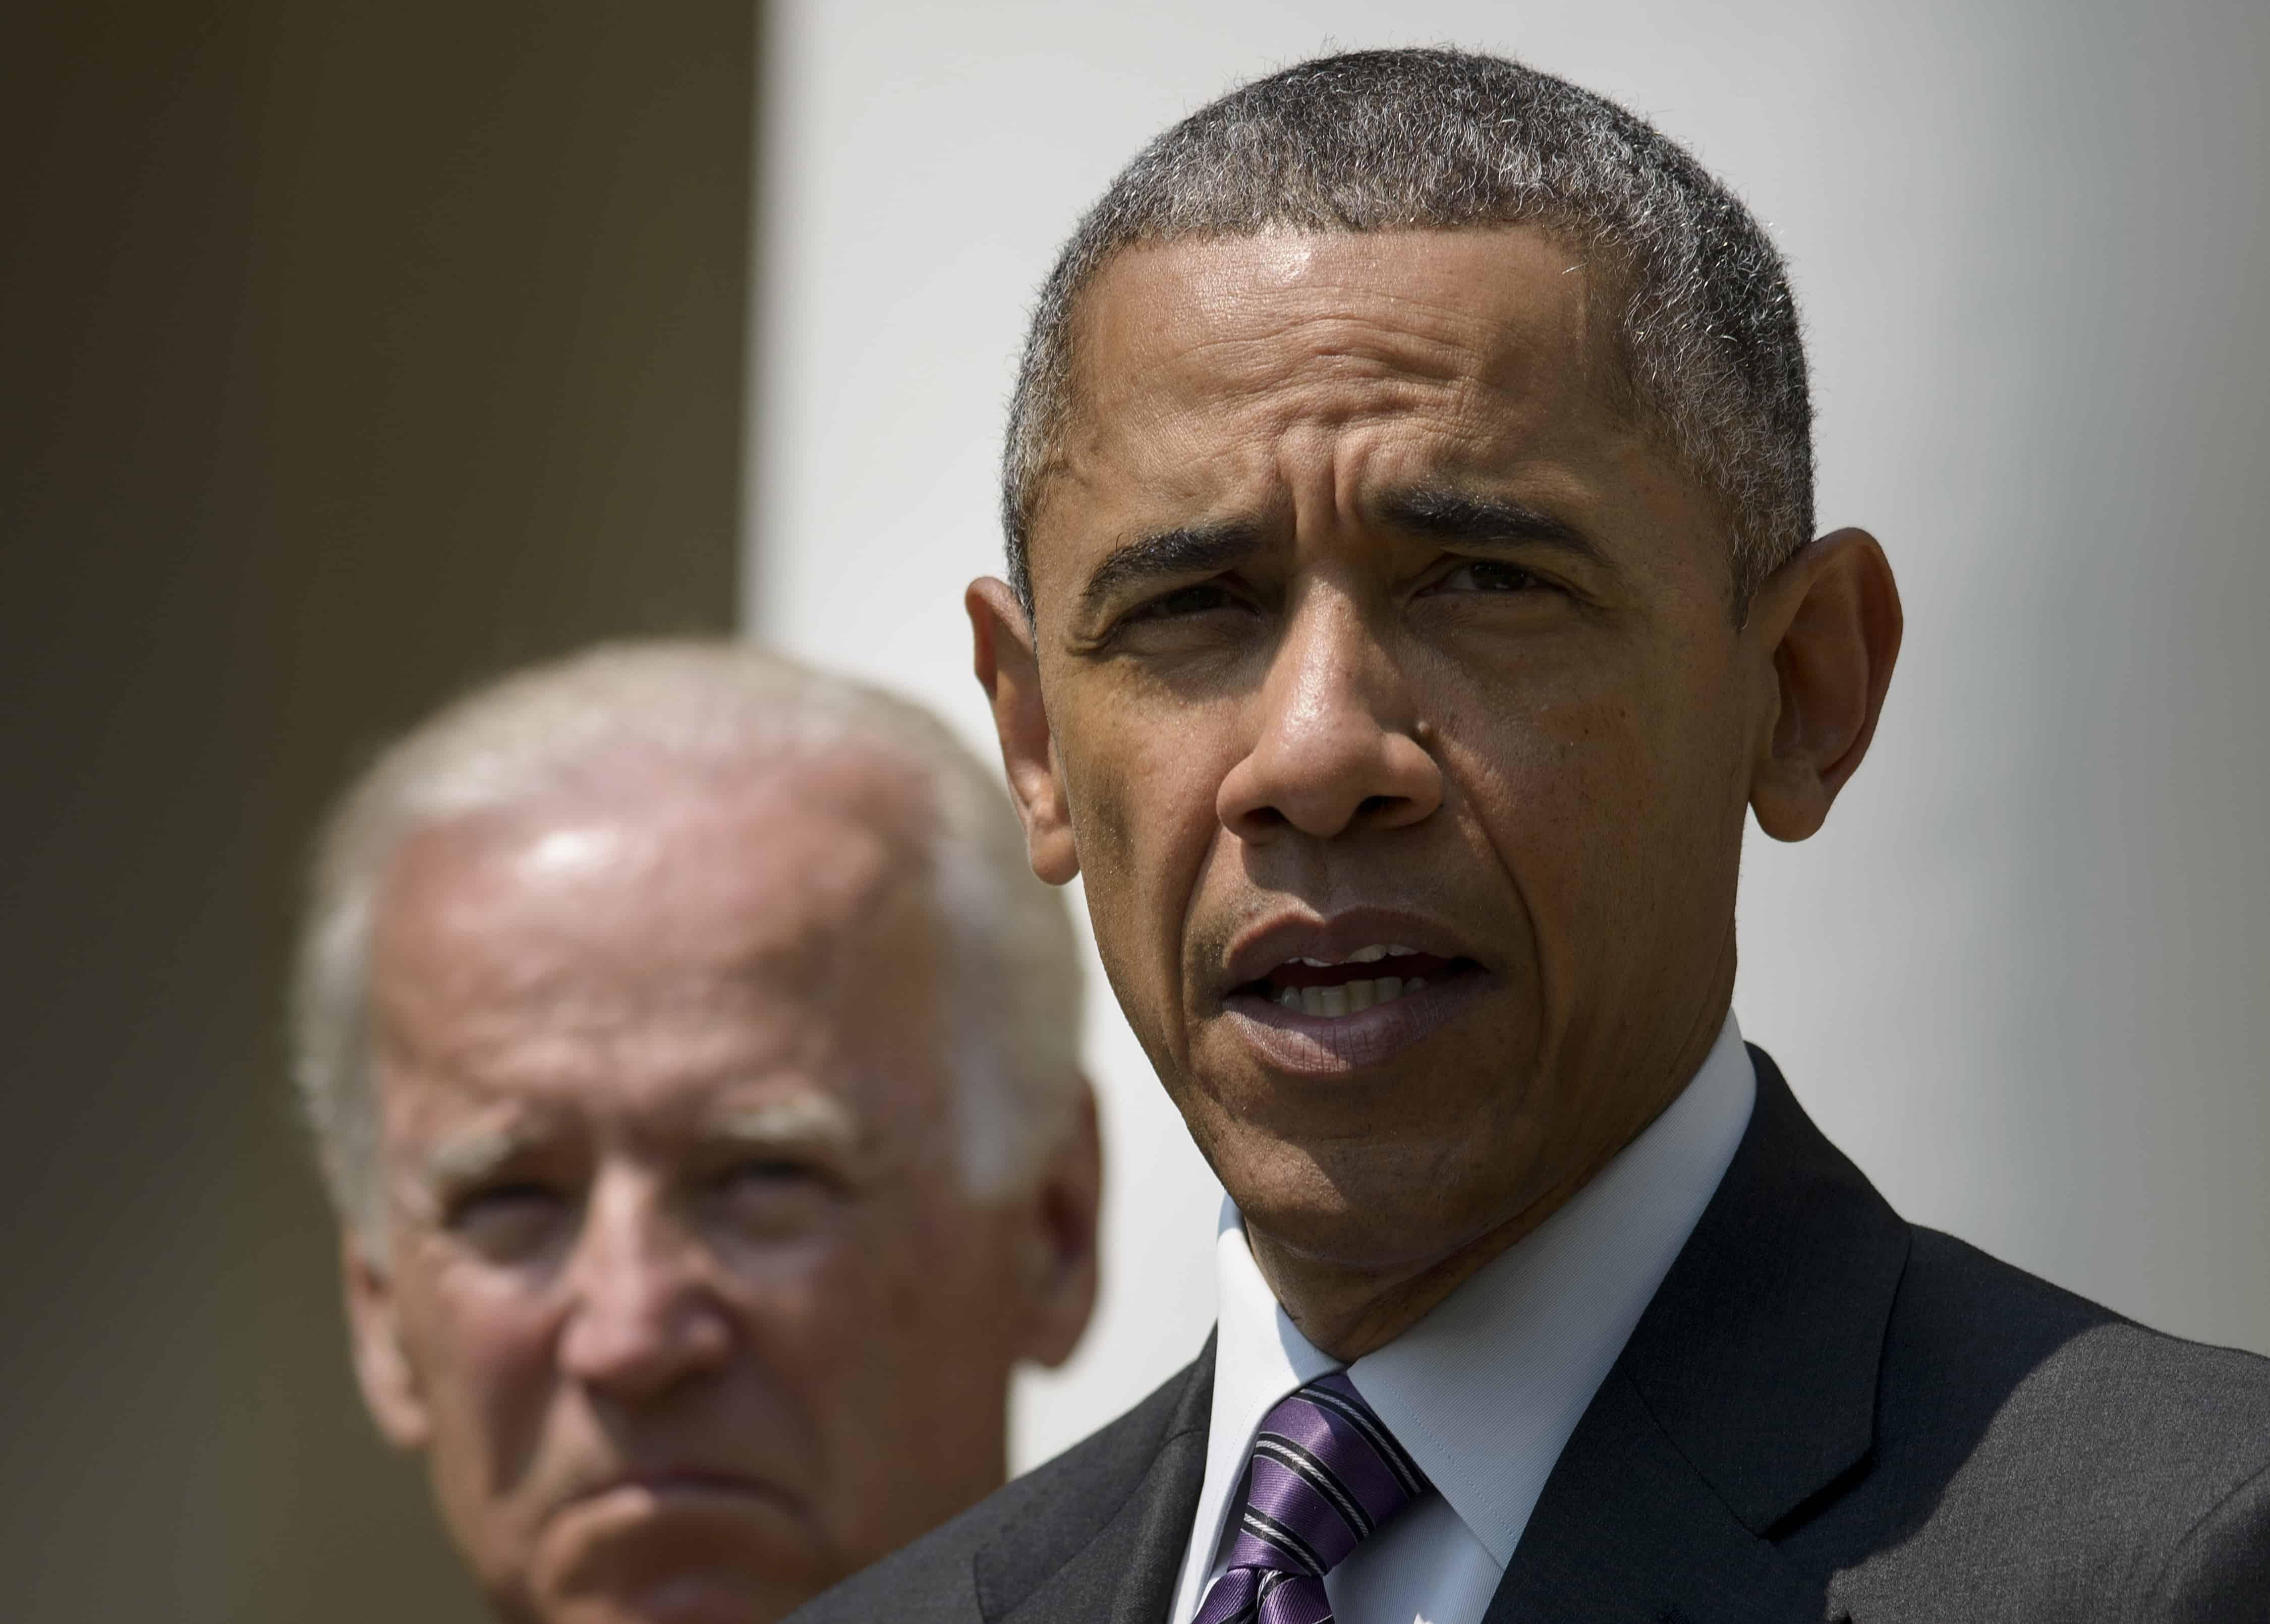 U.S. Vice President Joe Biden land President Barack Obama on Cuba embargo.